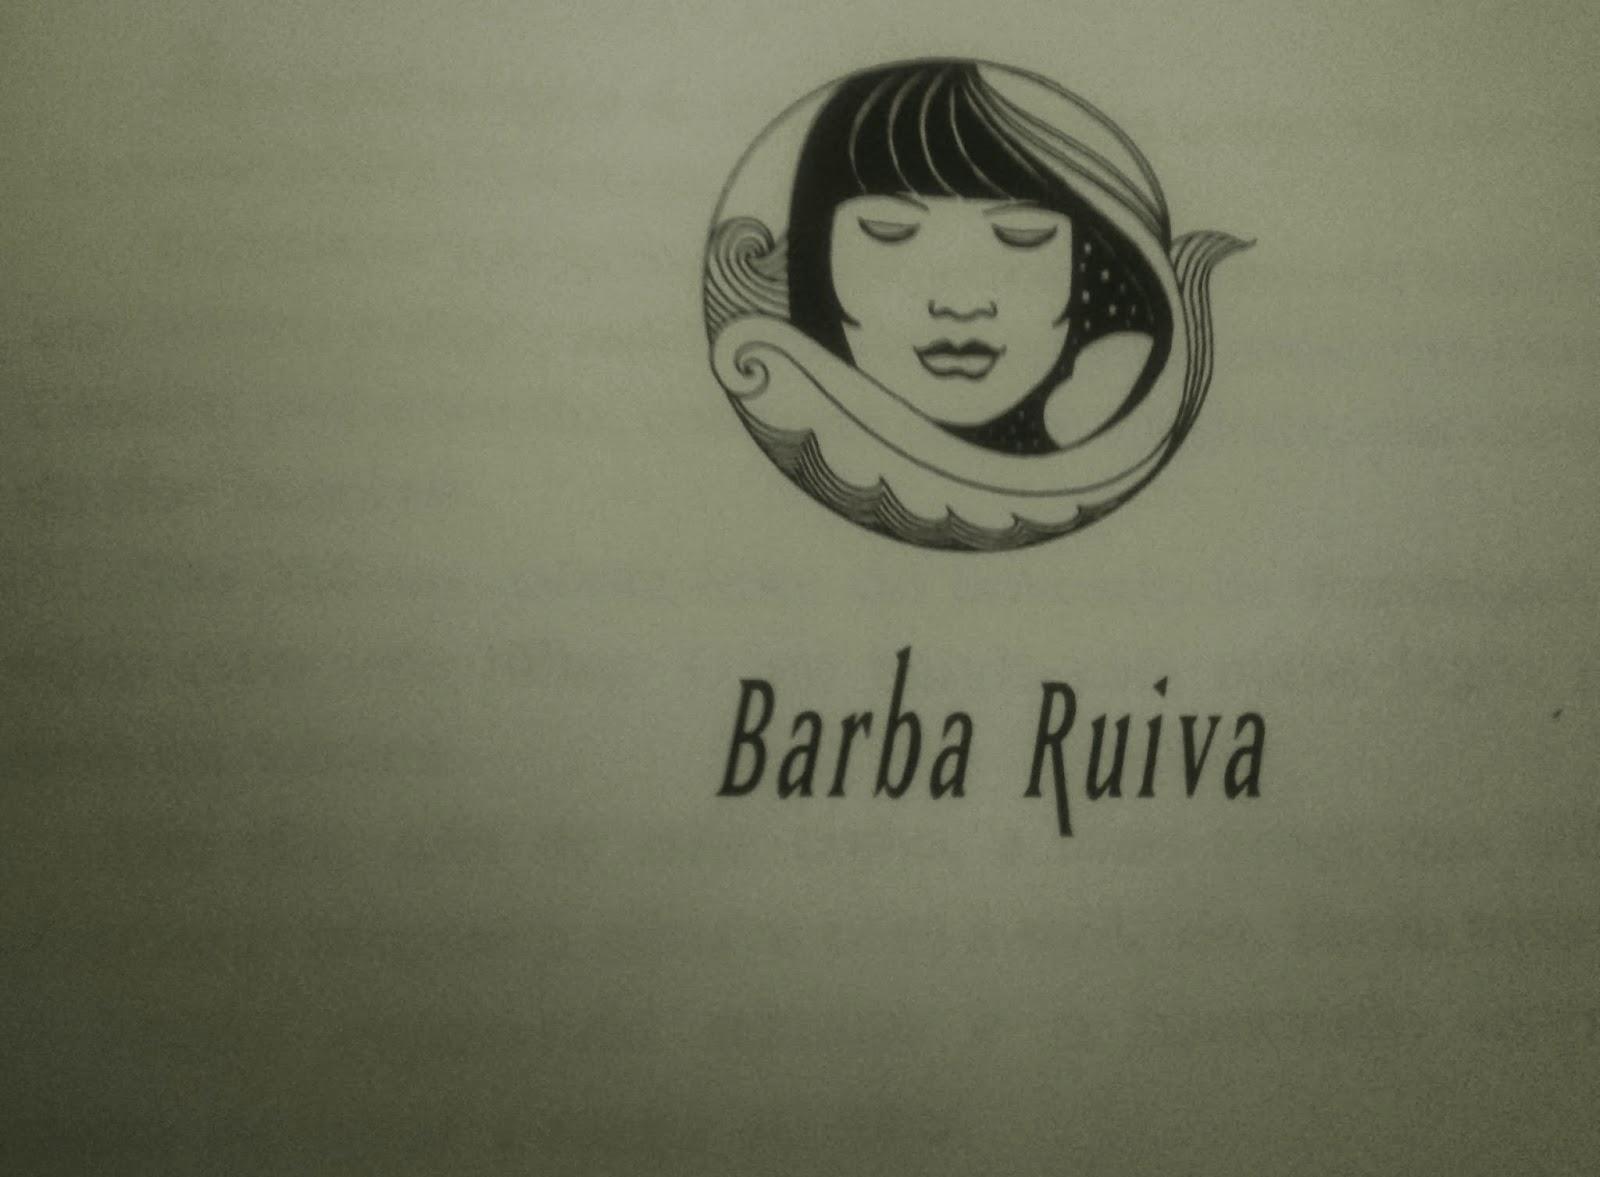 Blog Mortalha, Barba Ruiva, Lenda barba ruiva